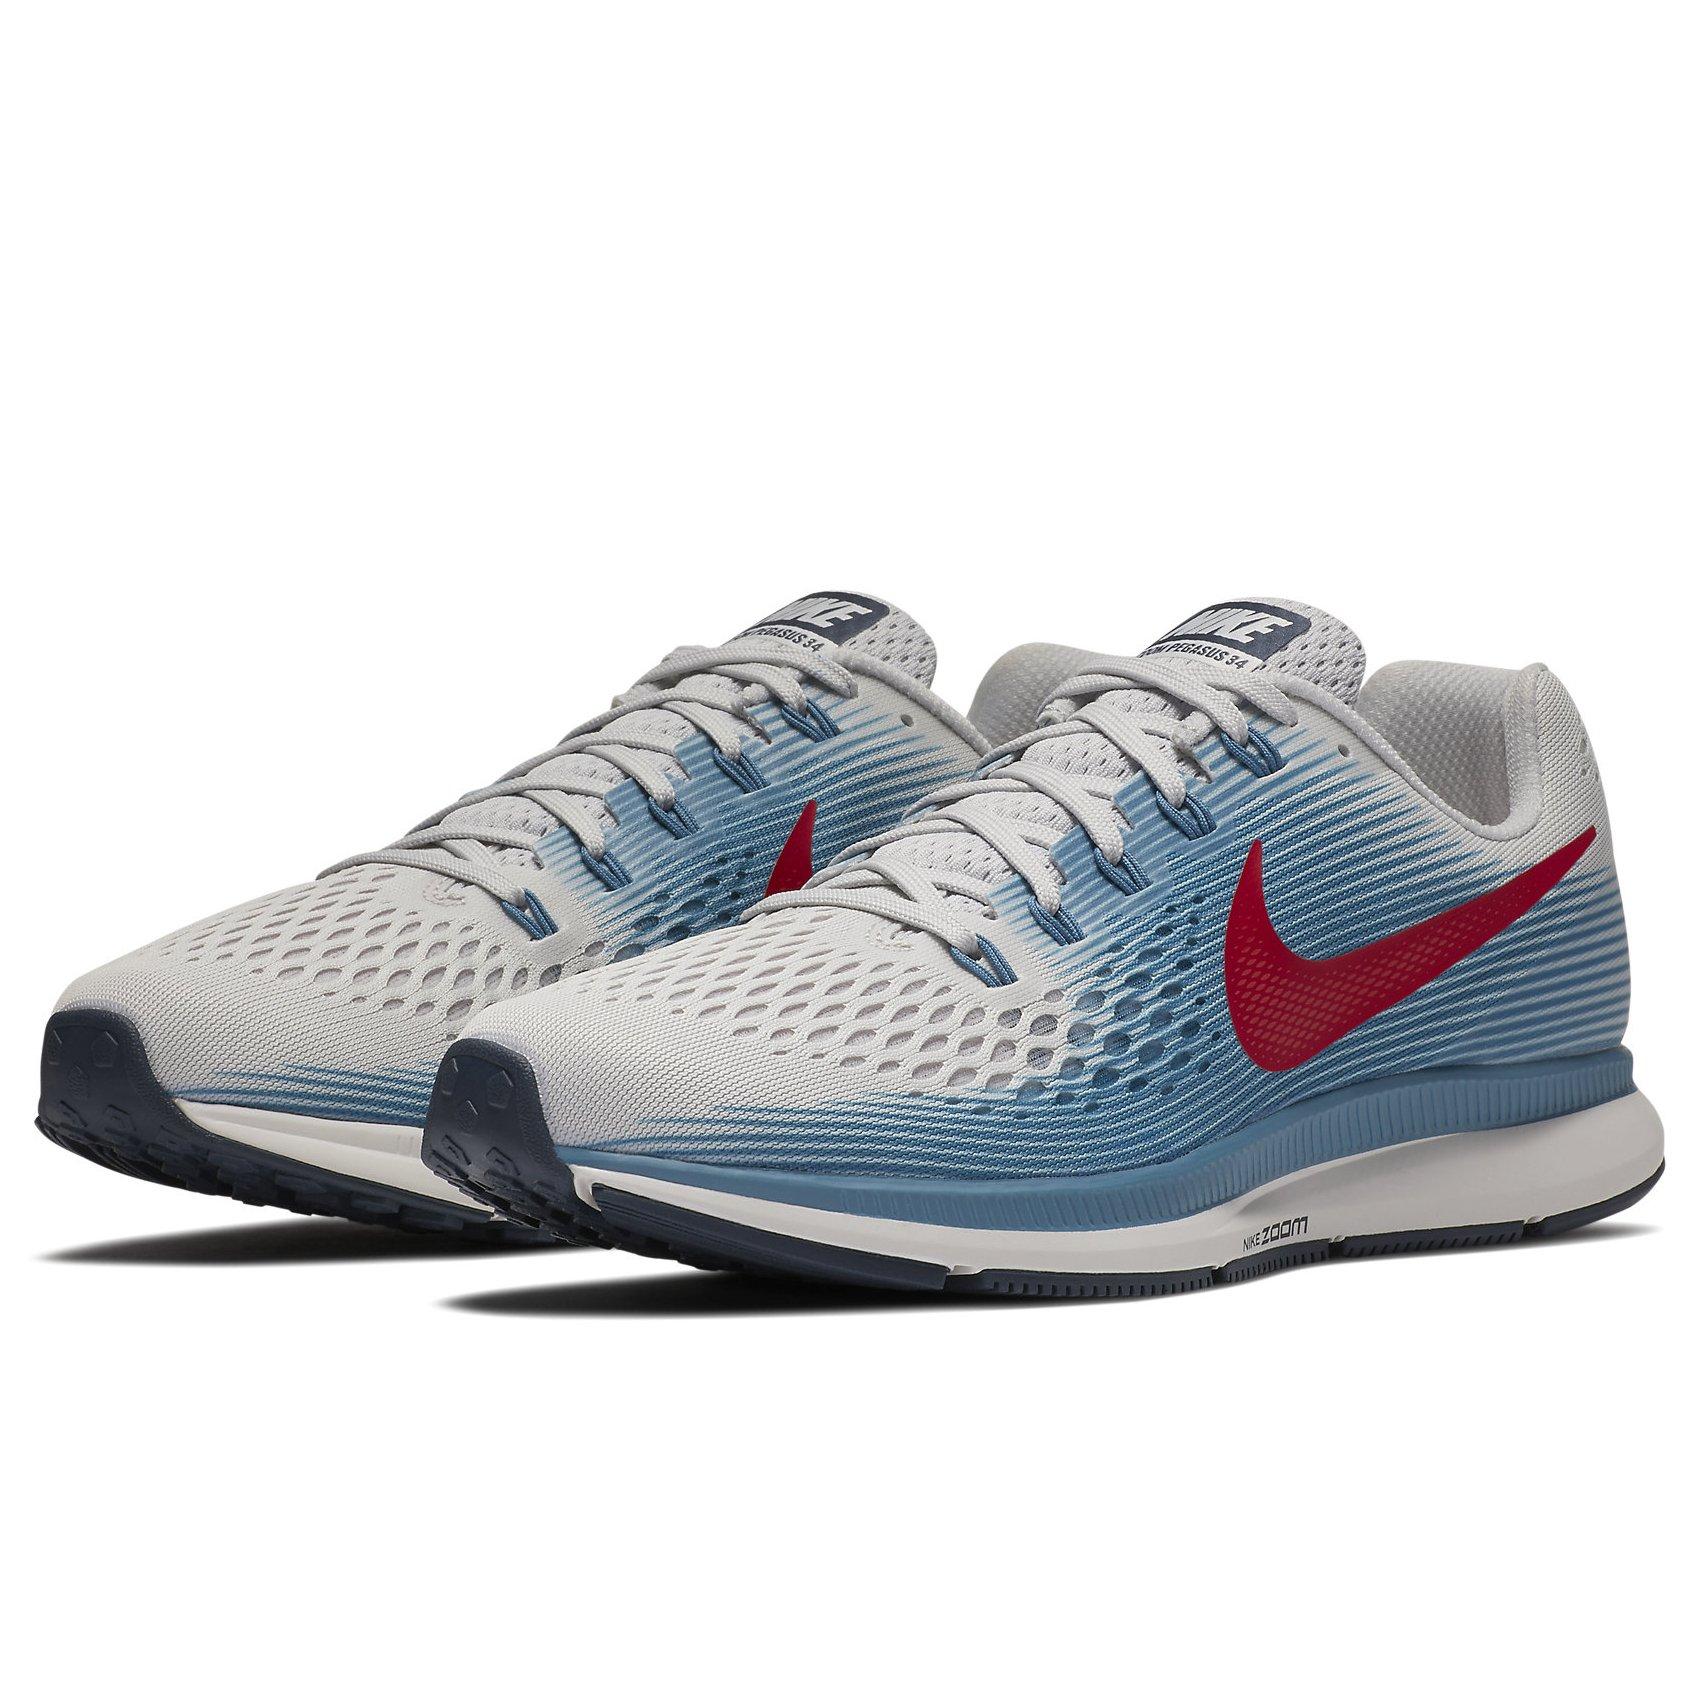 cd9842c7d77d NIKE Men s Air Zoom Pegasus 34 Running Shoe - 880555   Athletic   Clothing